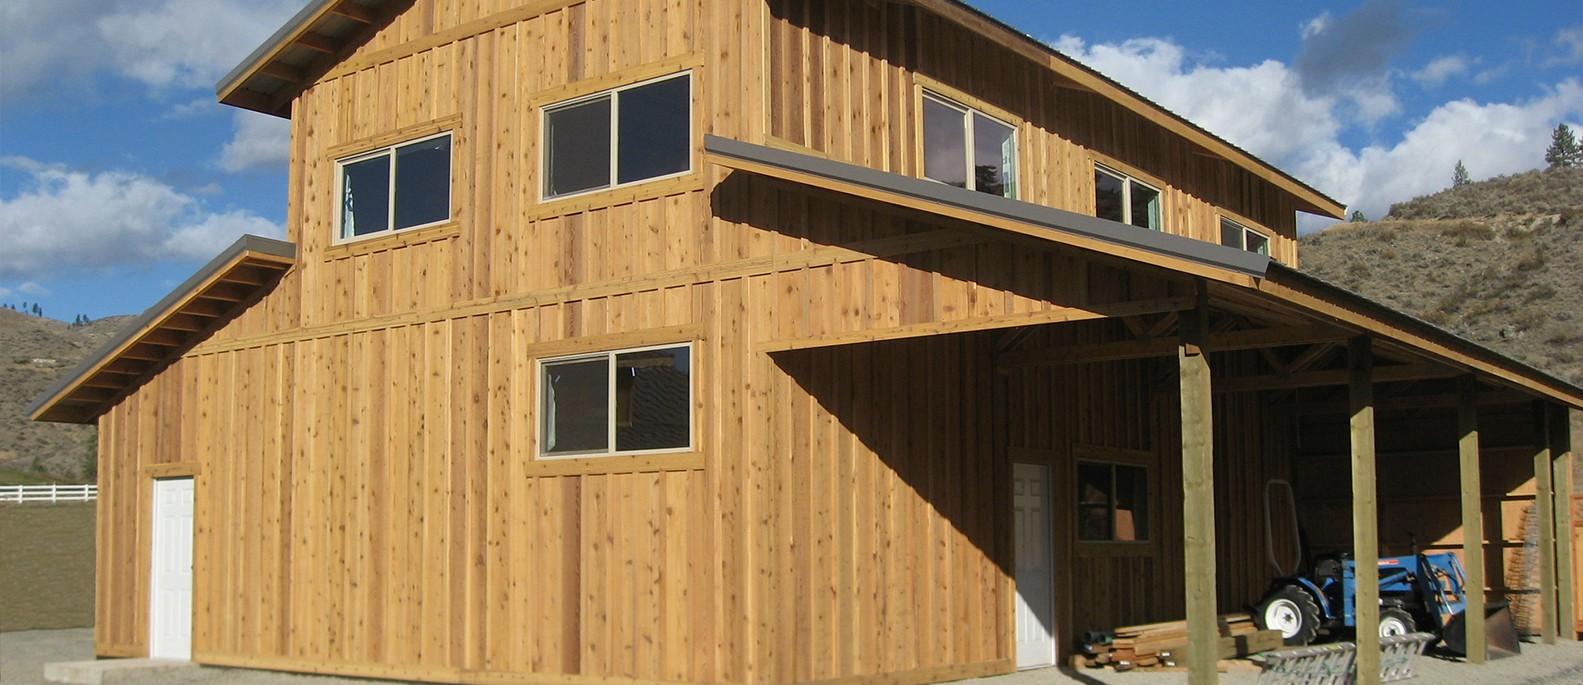 Debonair Banner Hansen Pole Buildings Pole Barn Building Kits Barn Homes Inexpensive Pole Barn Homes home decor Inexpensive Barn Homes